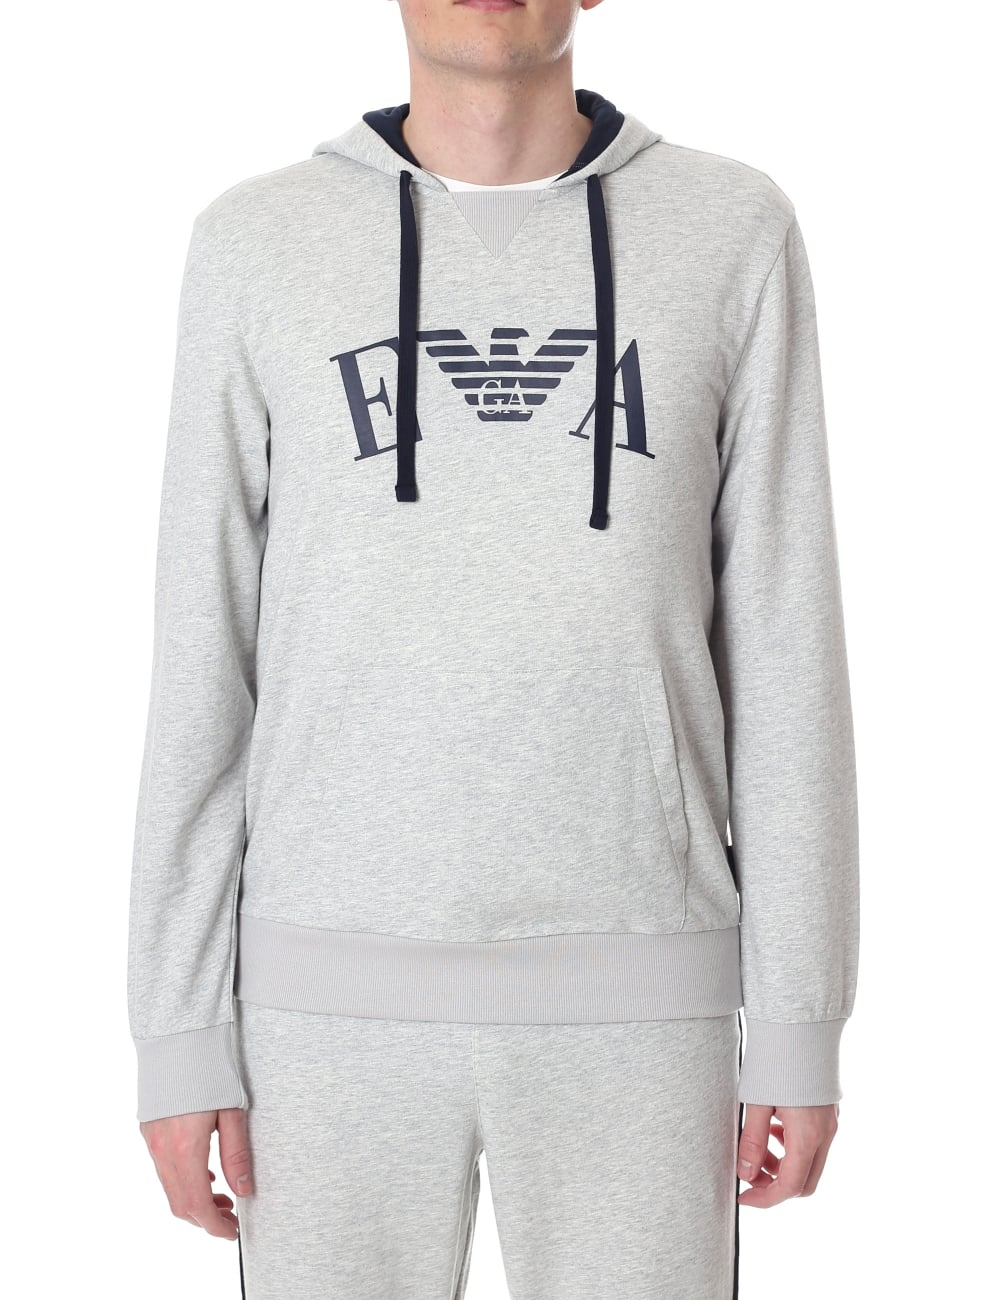 1a57c397 Emporio Armani Men's Pullover Hooded Sweat Top